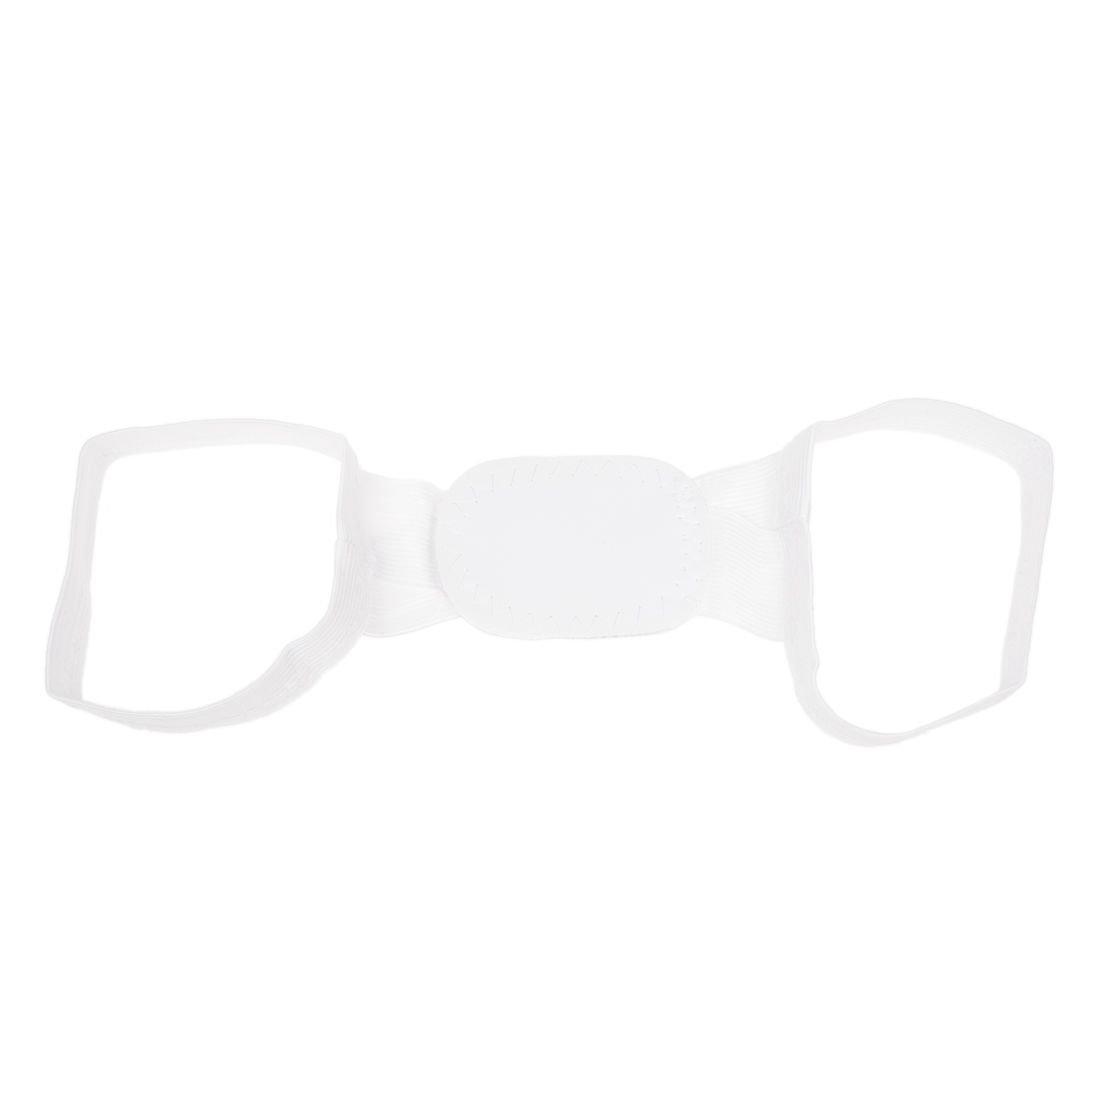 Beauty White Back Posture Women Body Shoulder Support Band Belt Brace Corrector